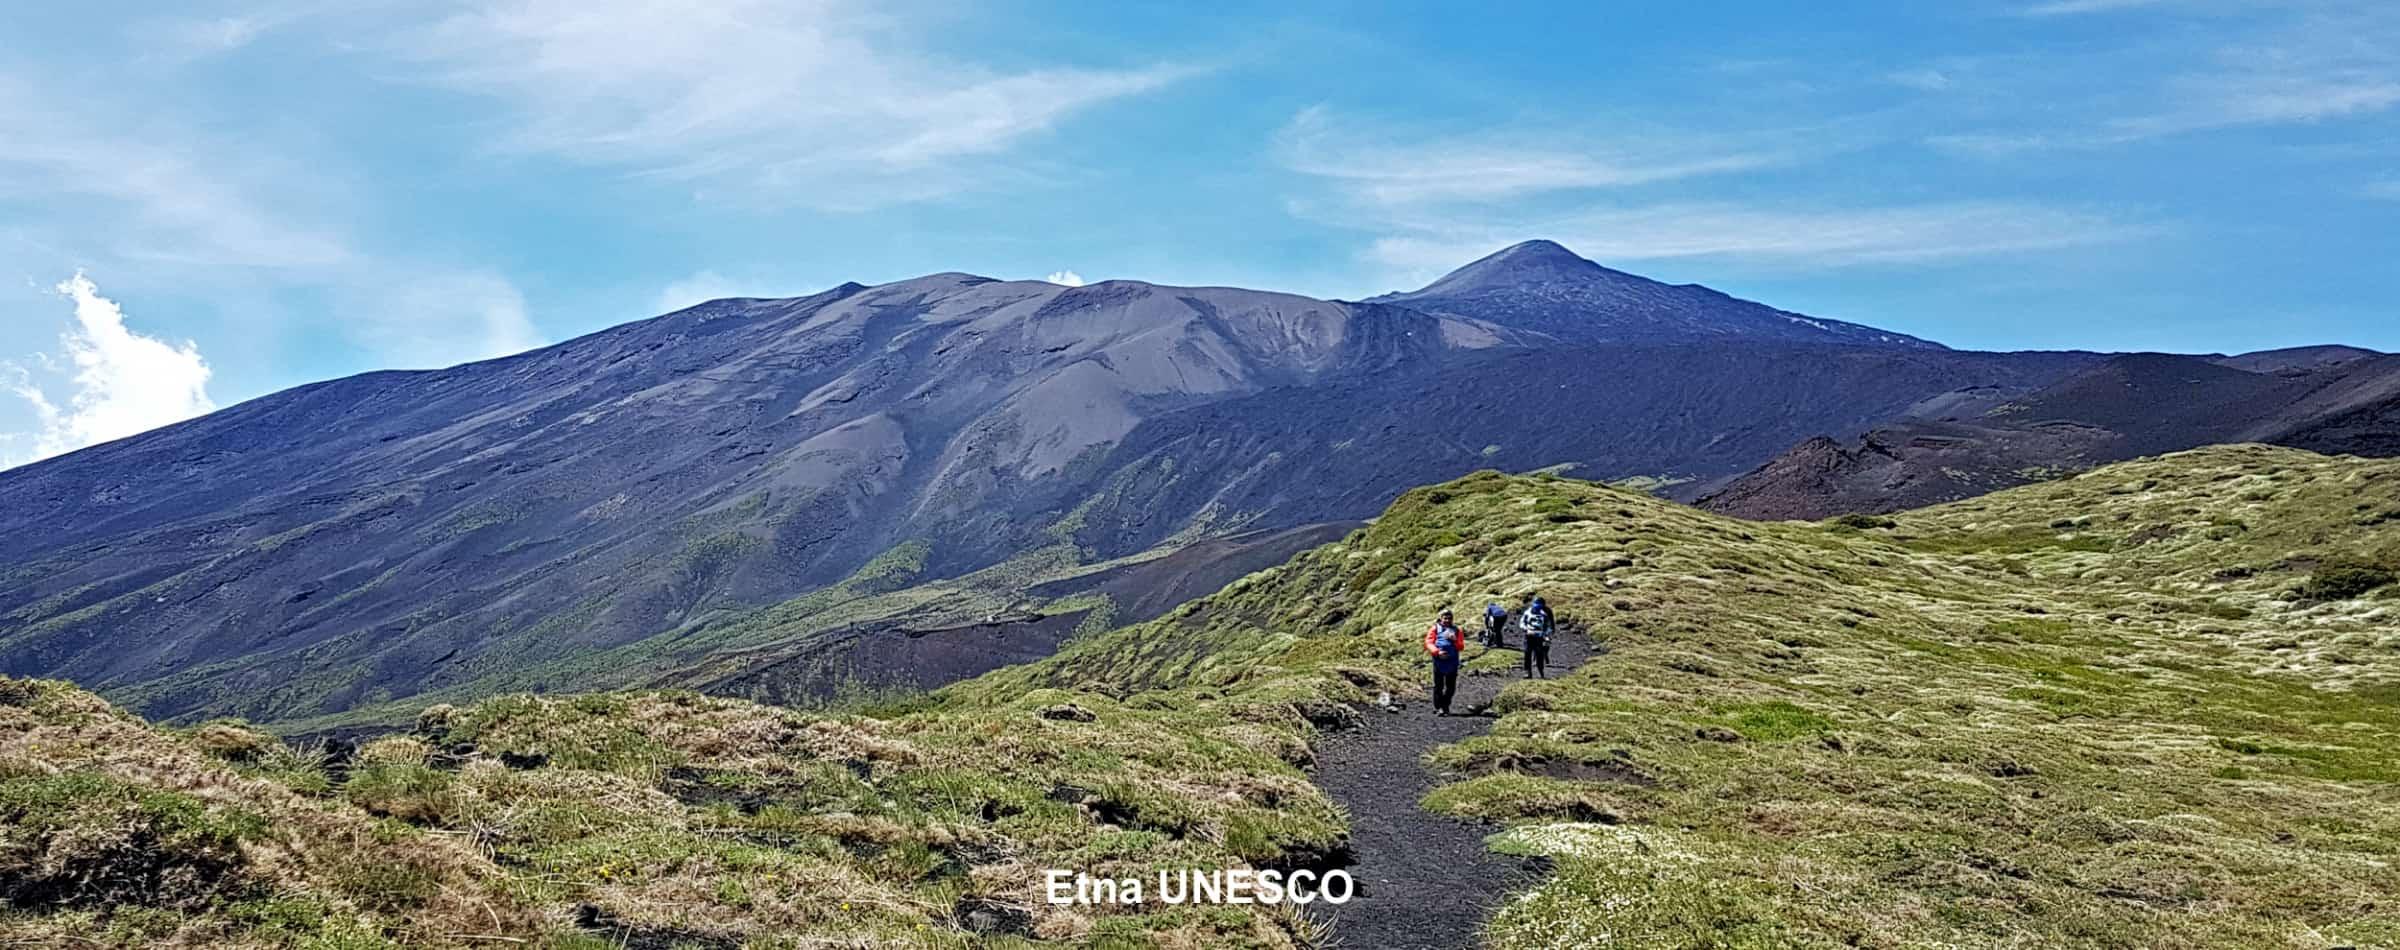 Etna UNESCO